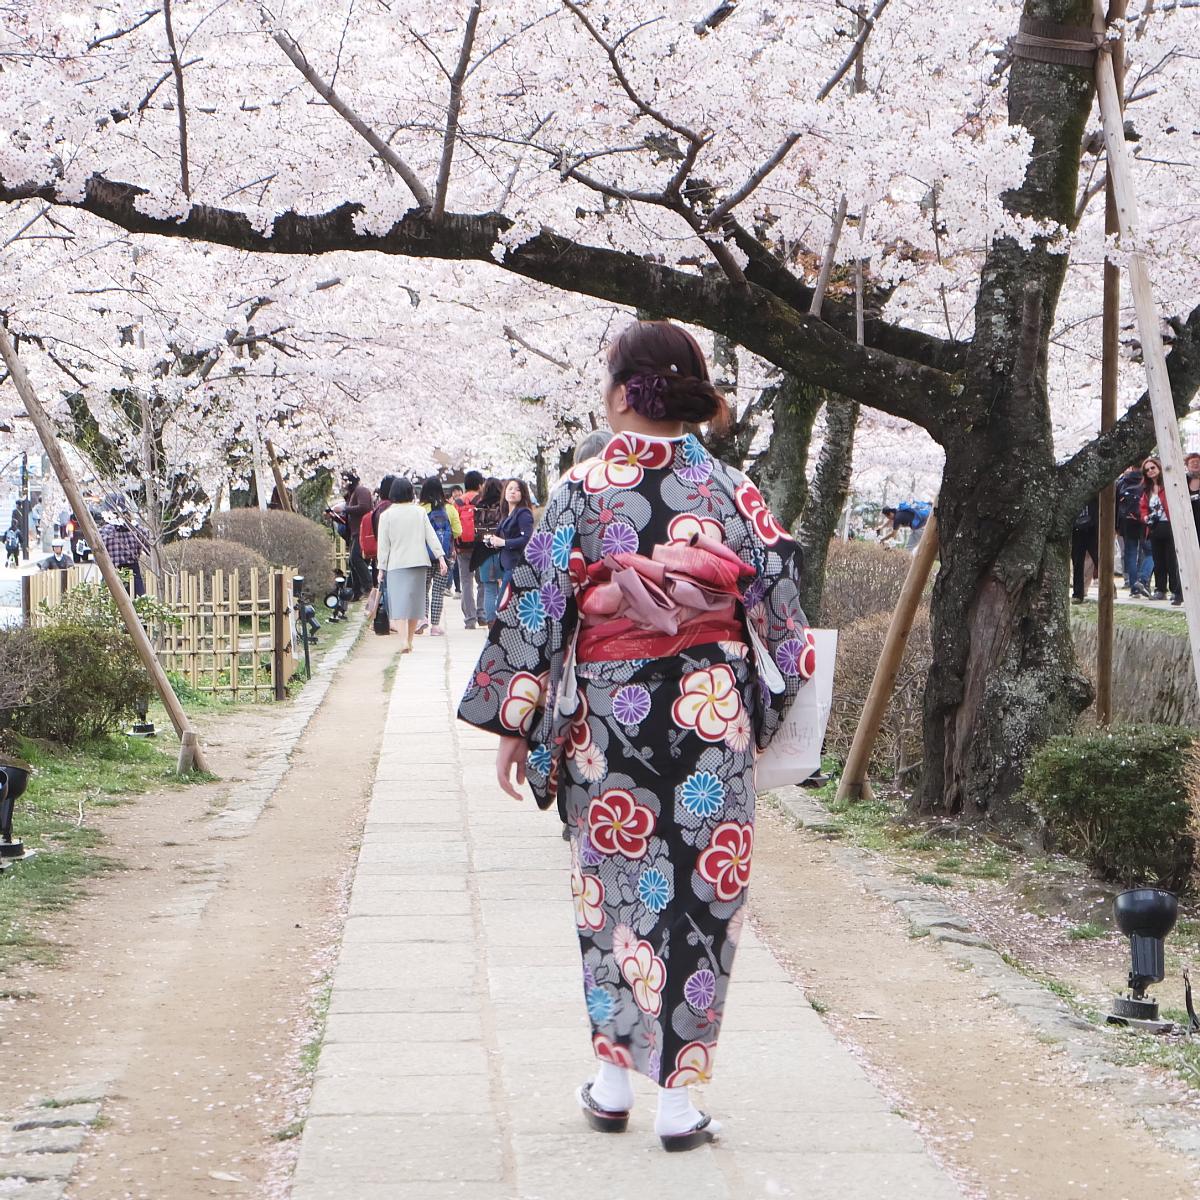 DSCF1070 kyoto sakura cherry blossoms spring 2016